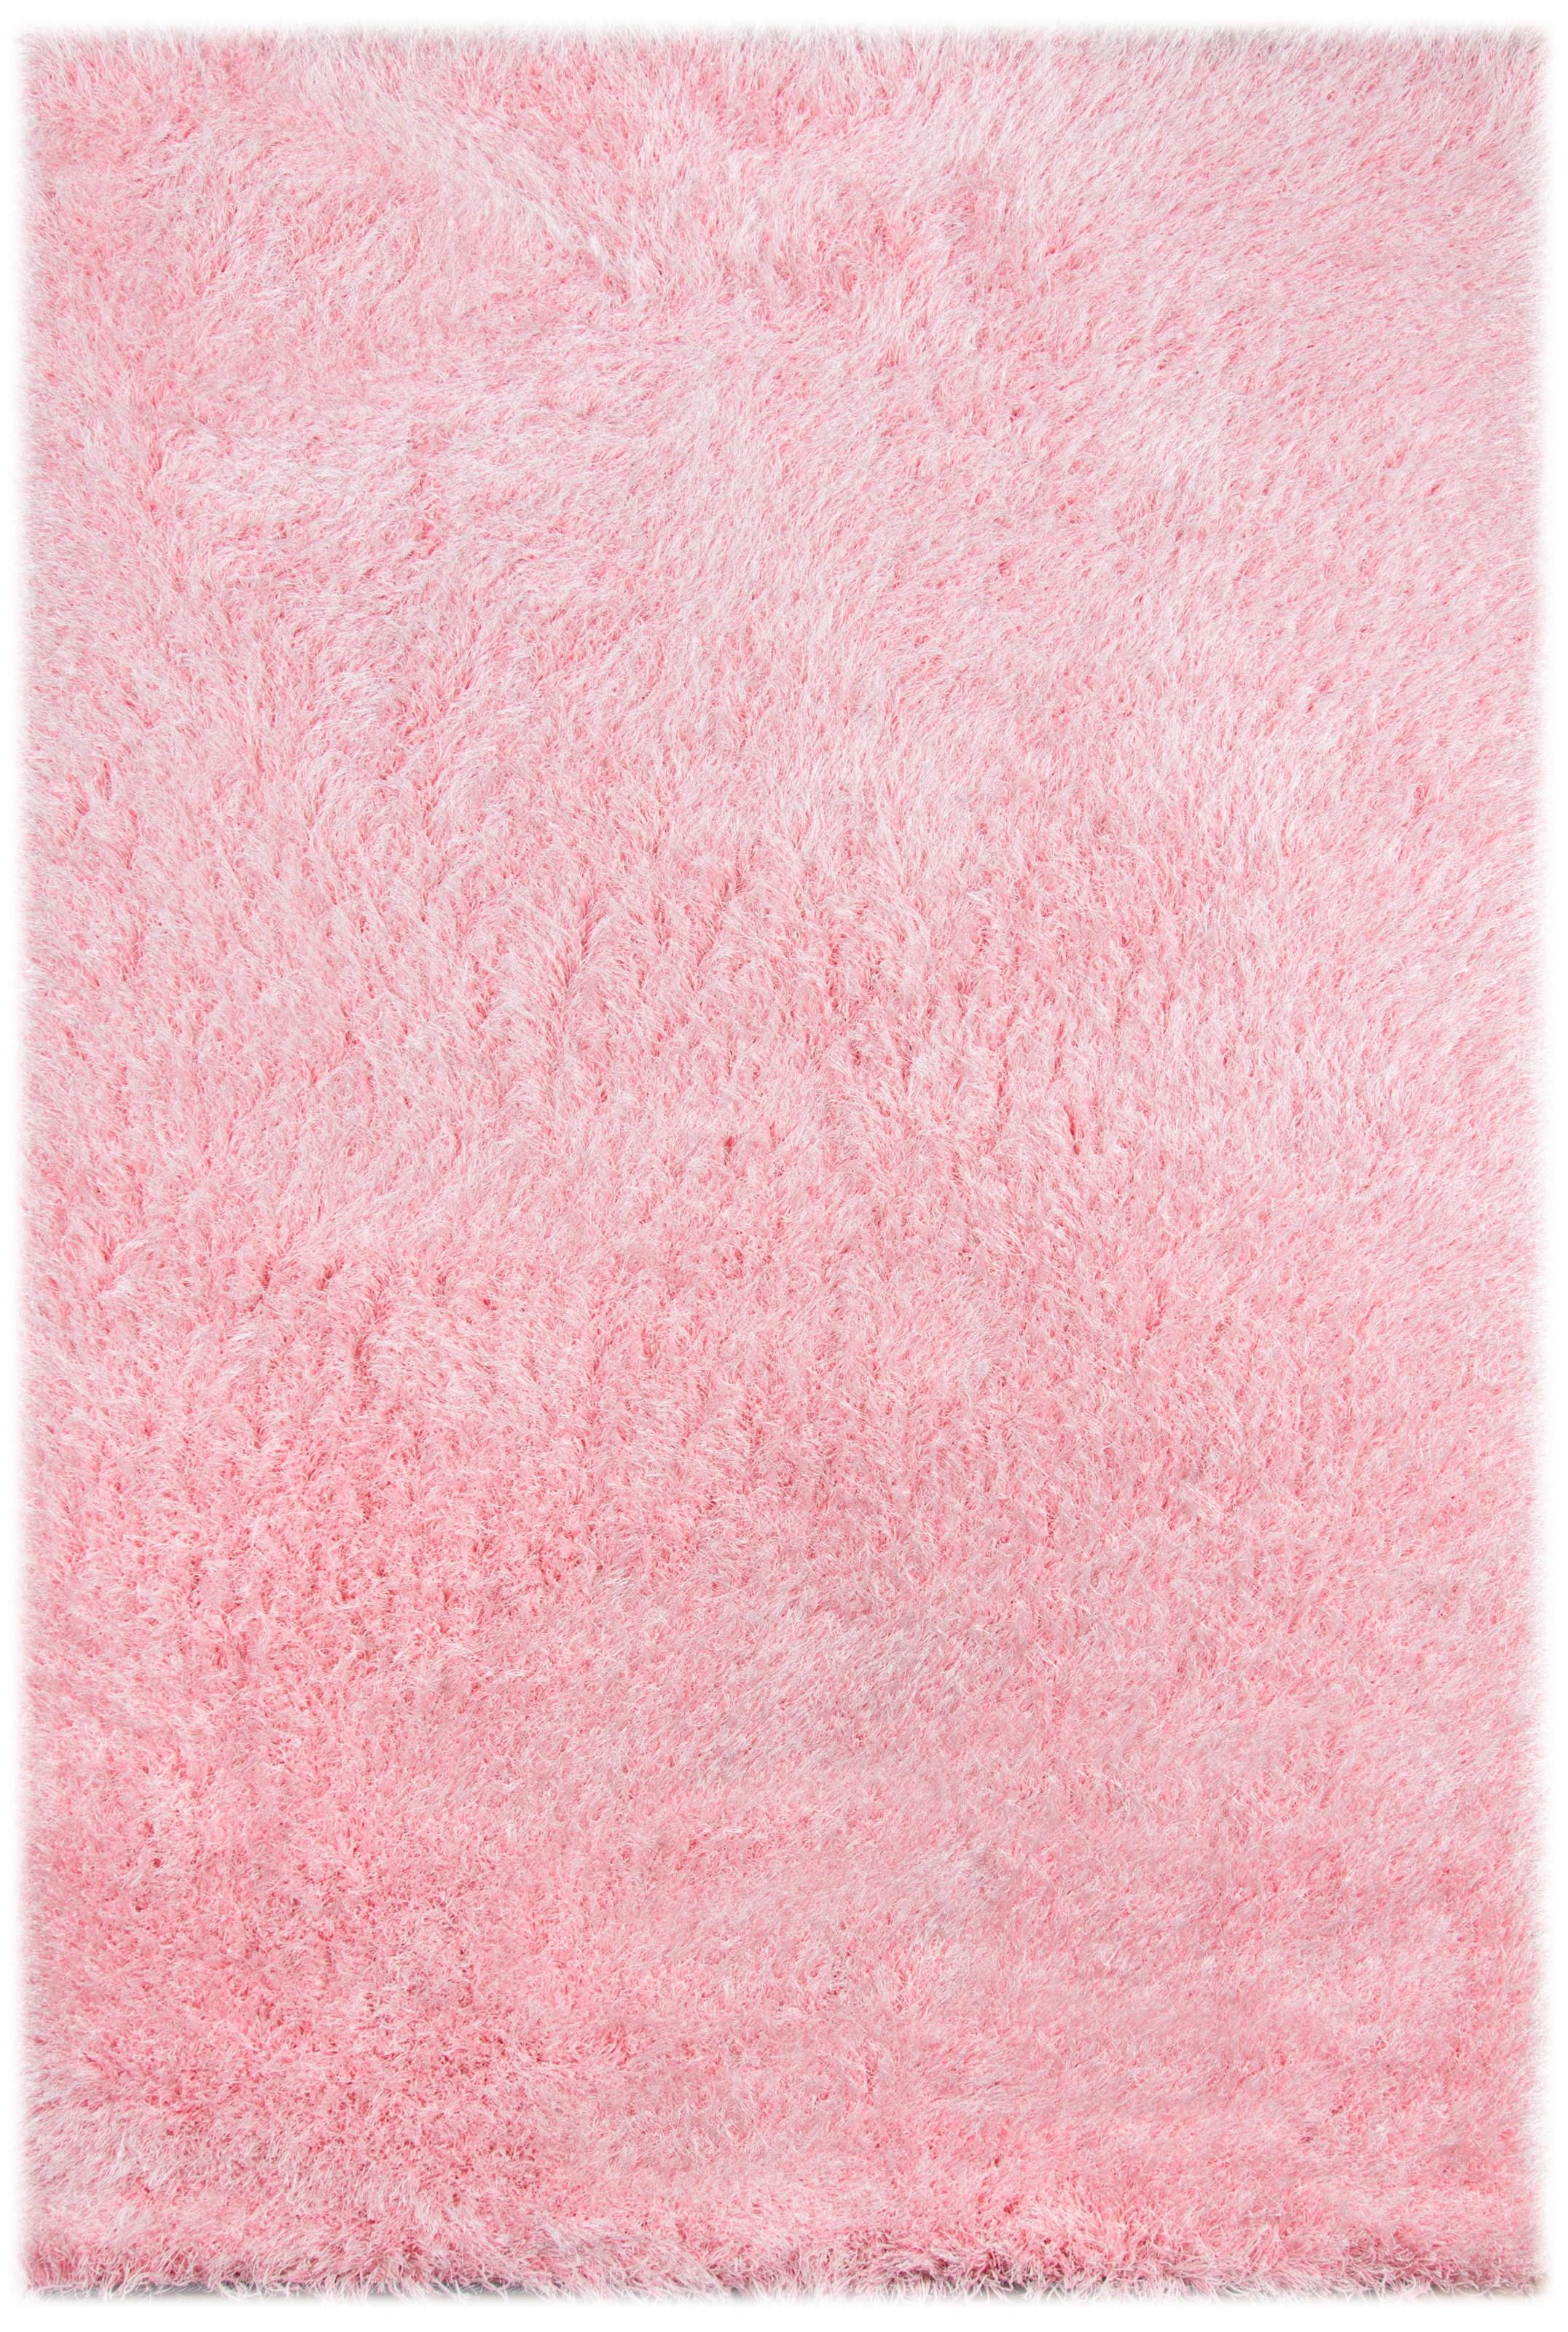 Metro Pink Shag by Amer Rugs at Sprintz Furniture